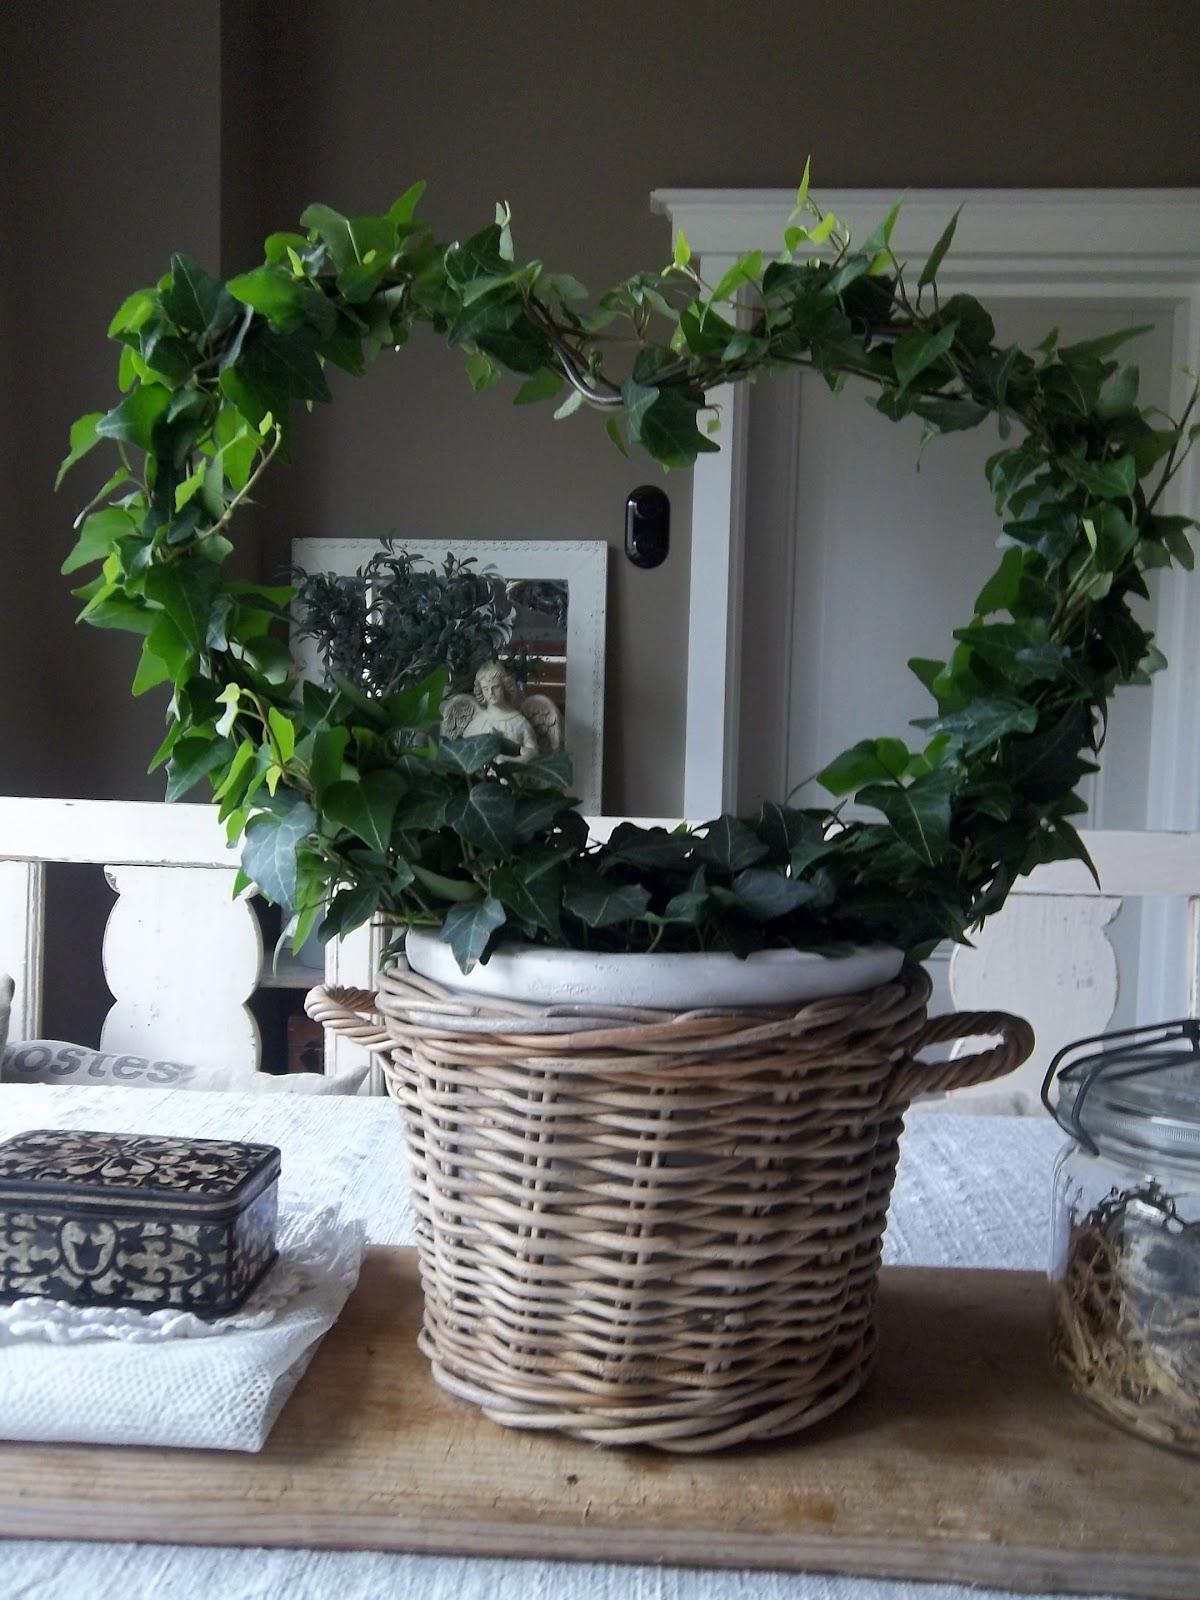 Riviera Maison Keuken Pot : Kind van Holland Brocante: Op tafel